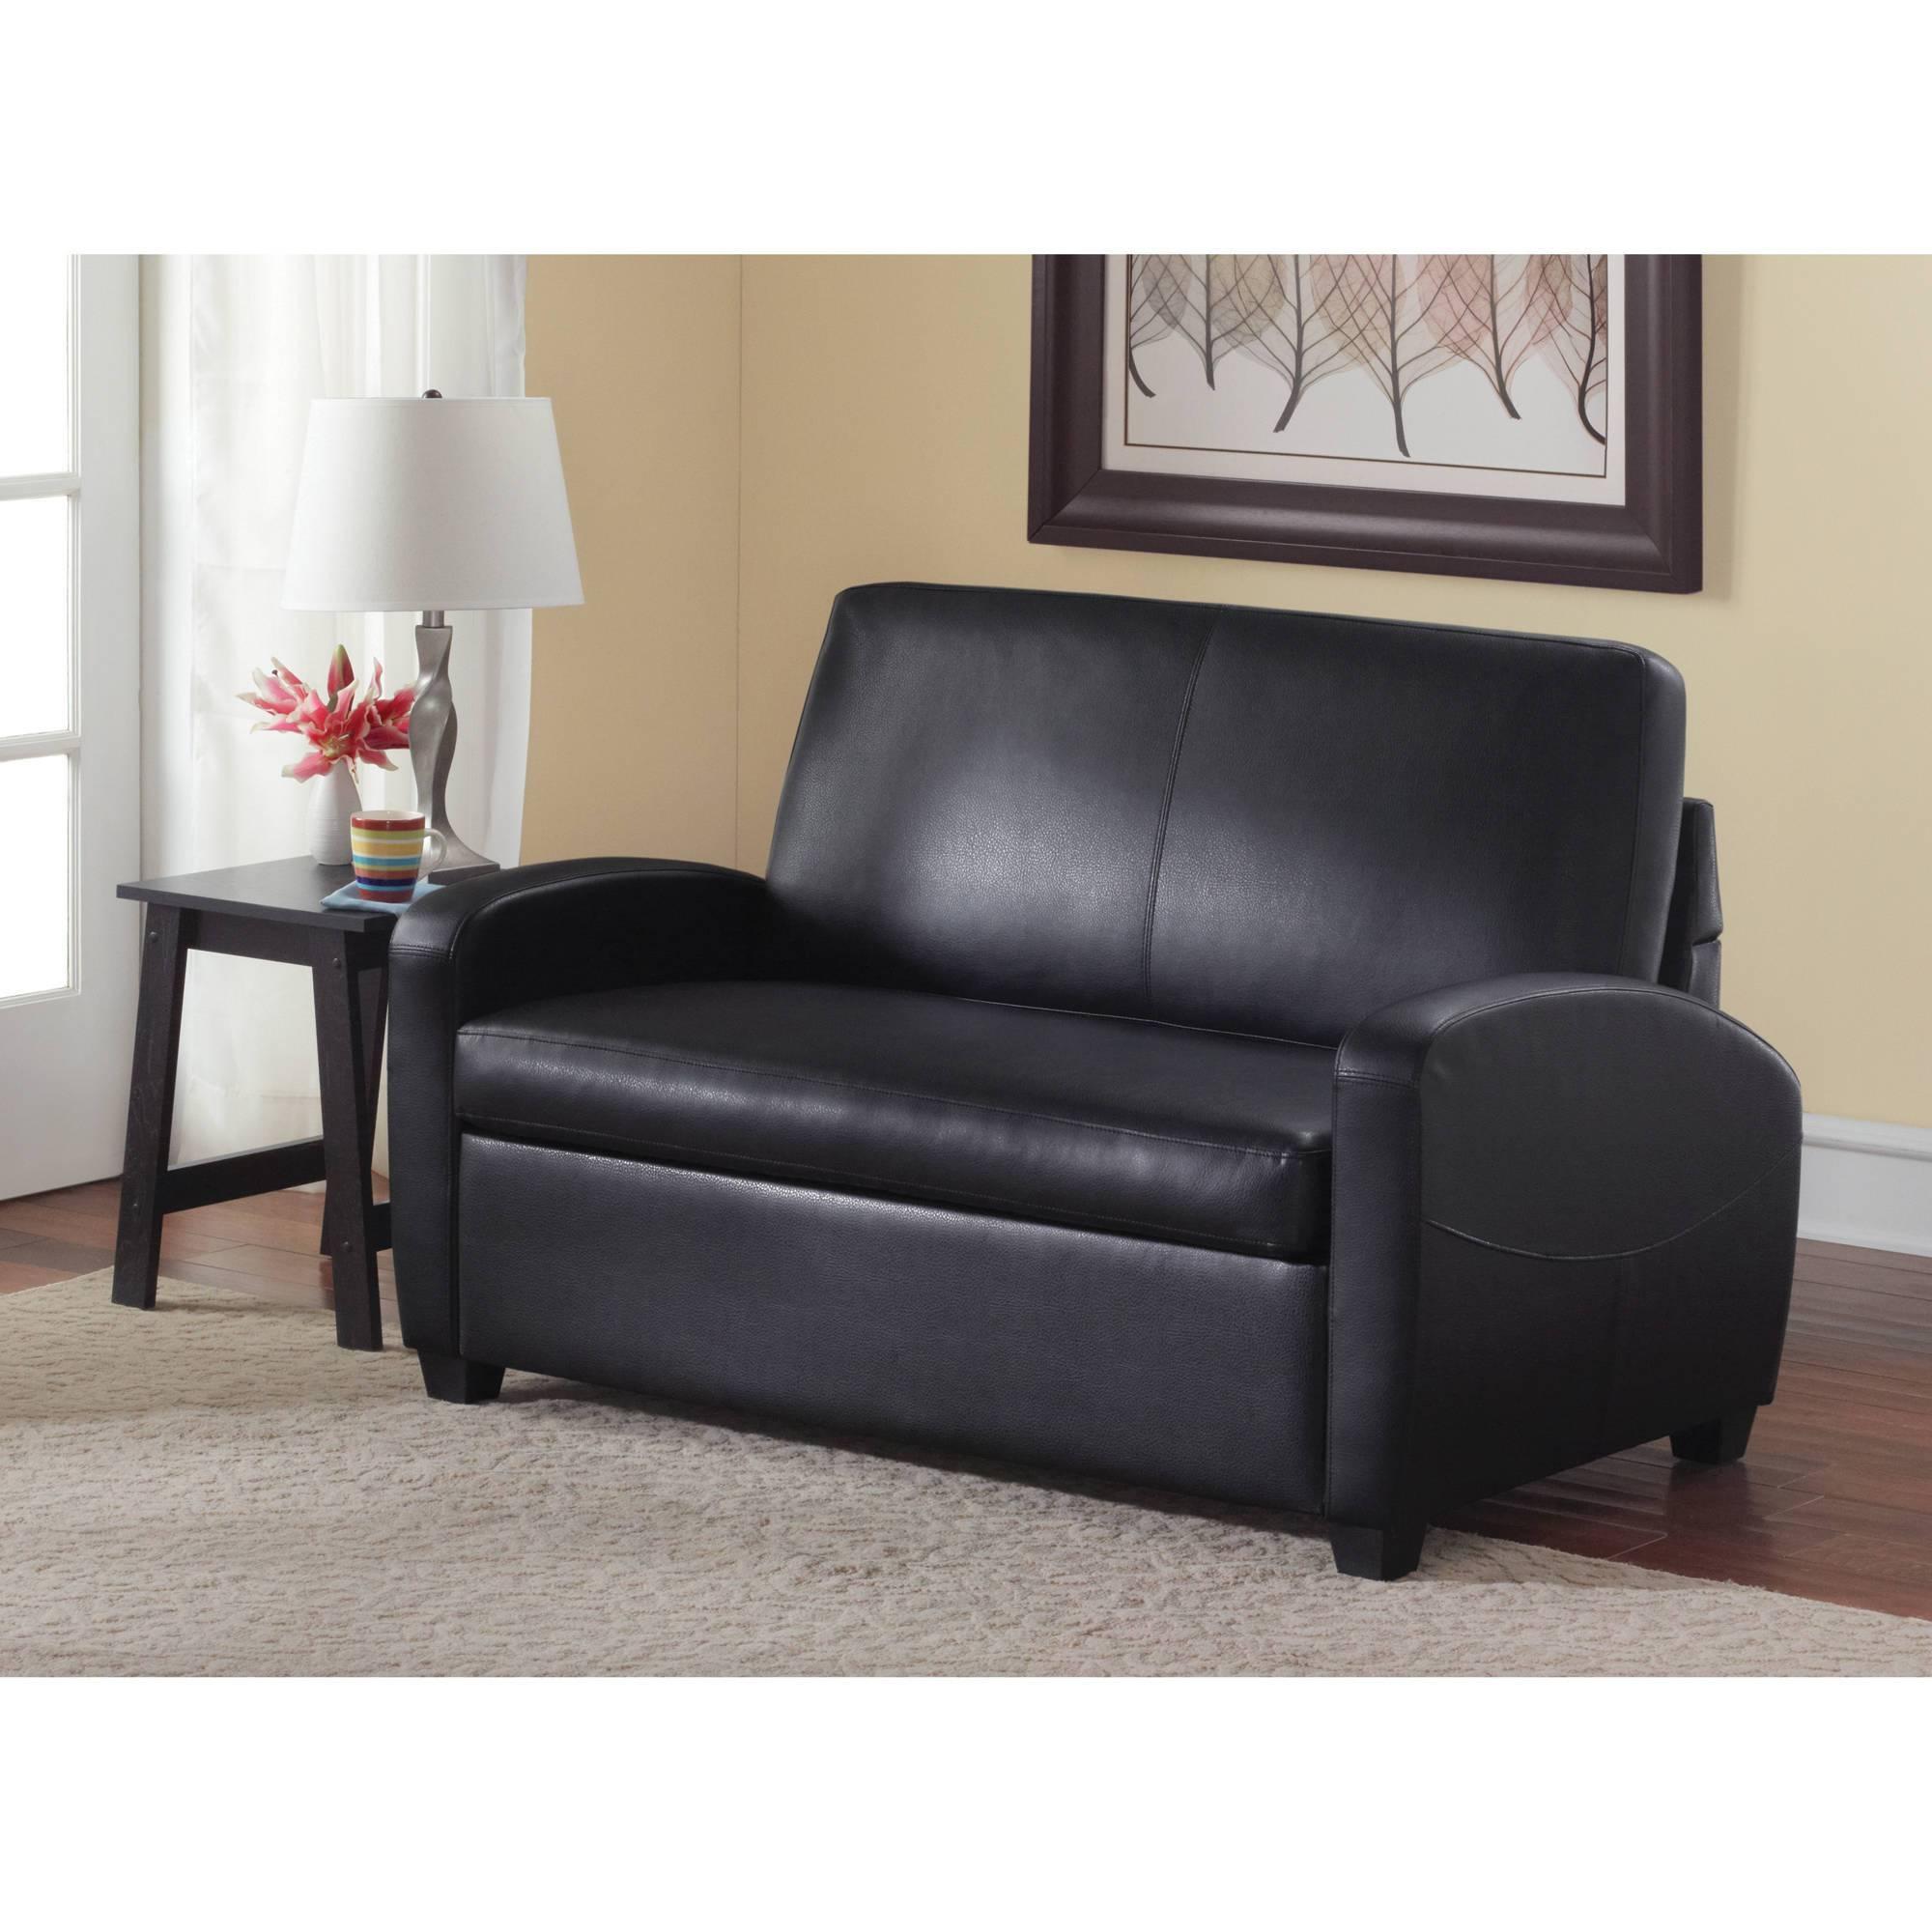 Furniture: Sleeper Chair Ikea | Ikea Sofa Sleeper | Futon Kmart with Kmart Futon Beds (Image 8 of 15)